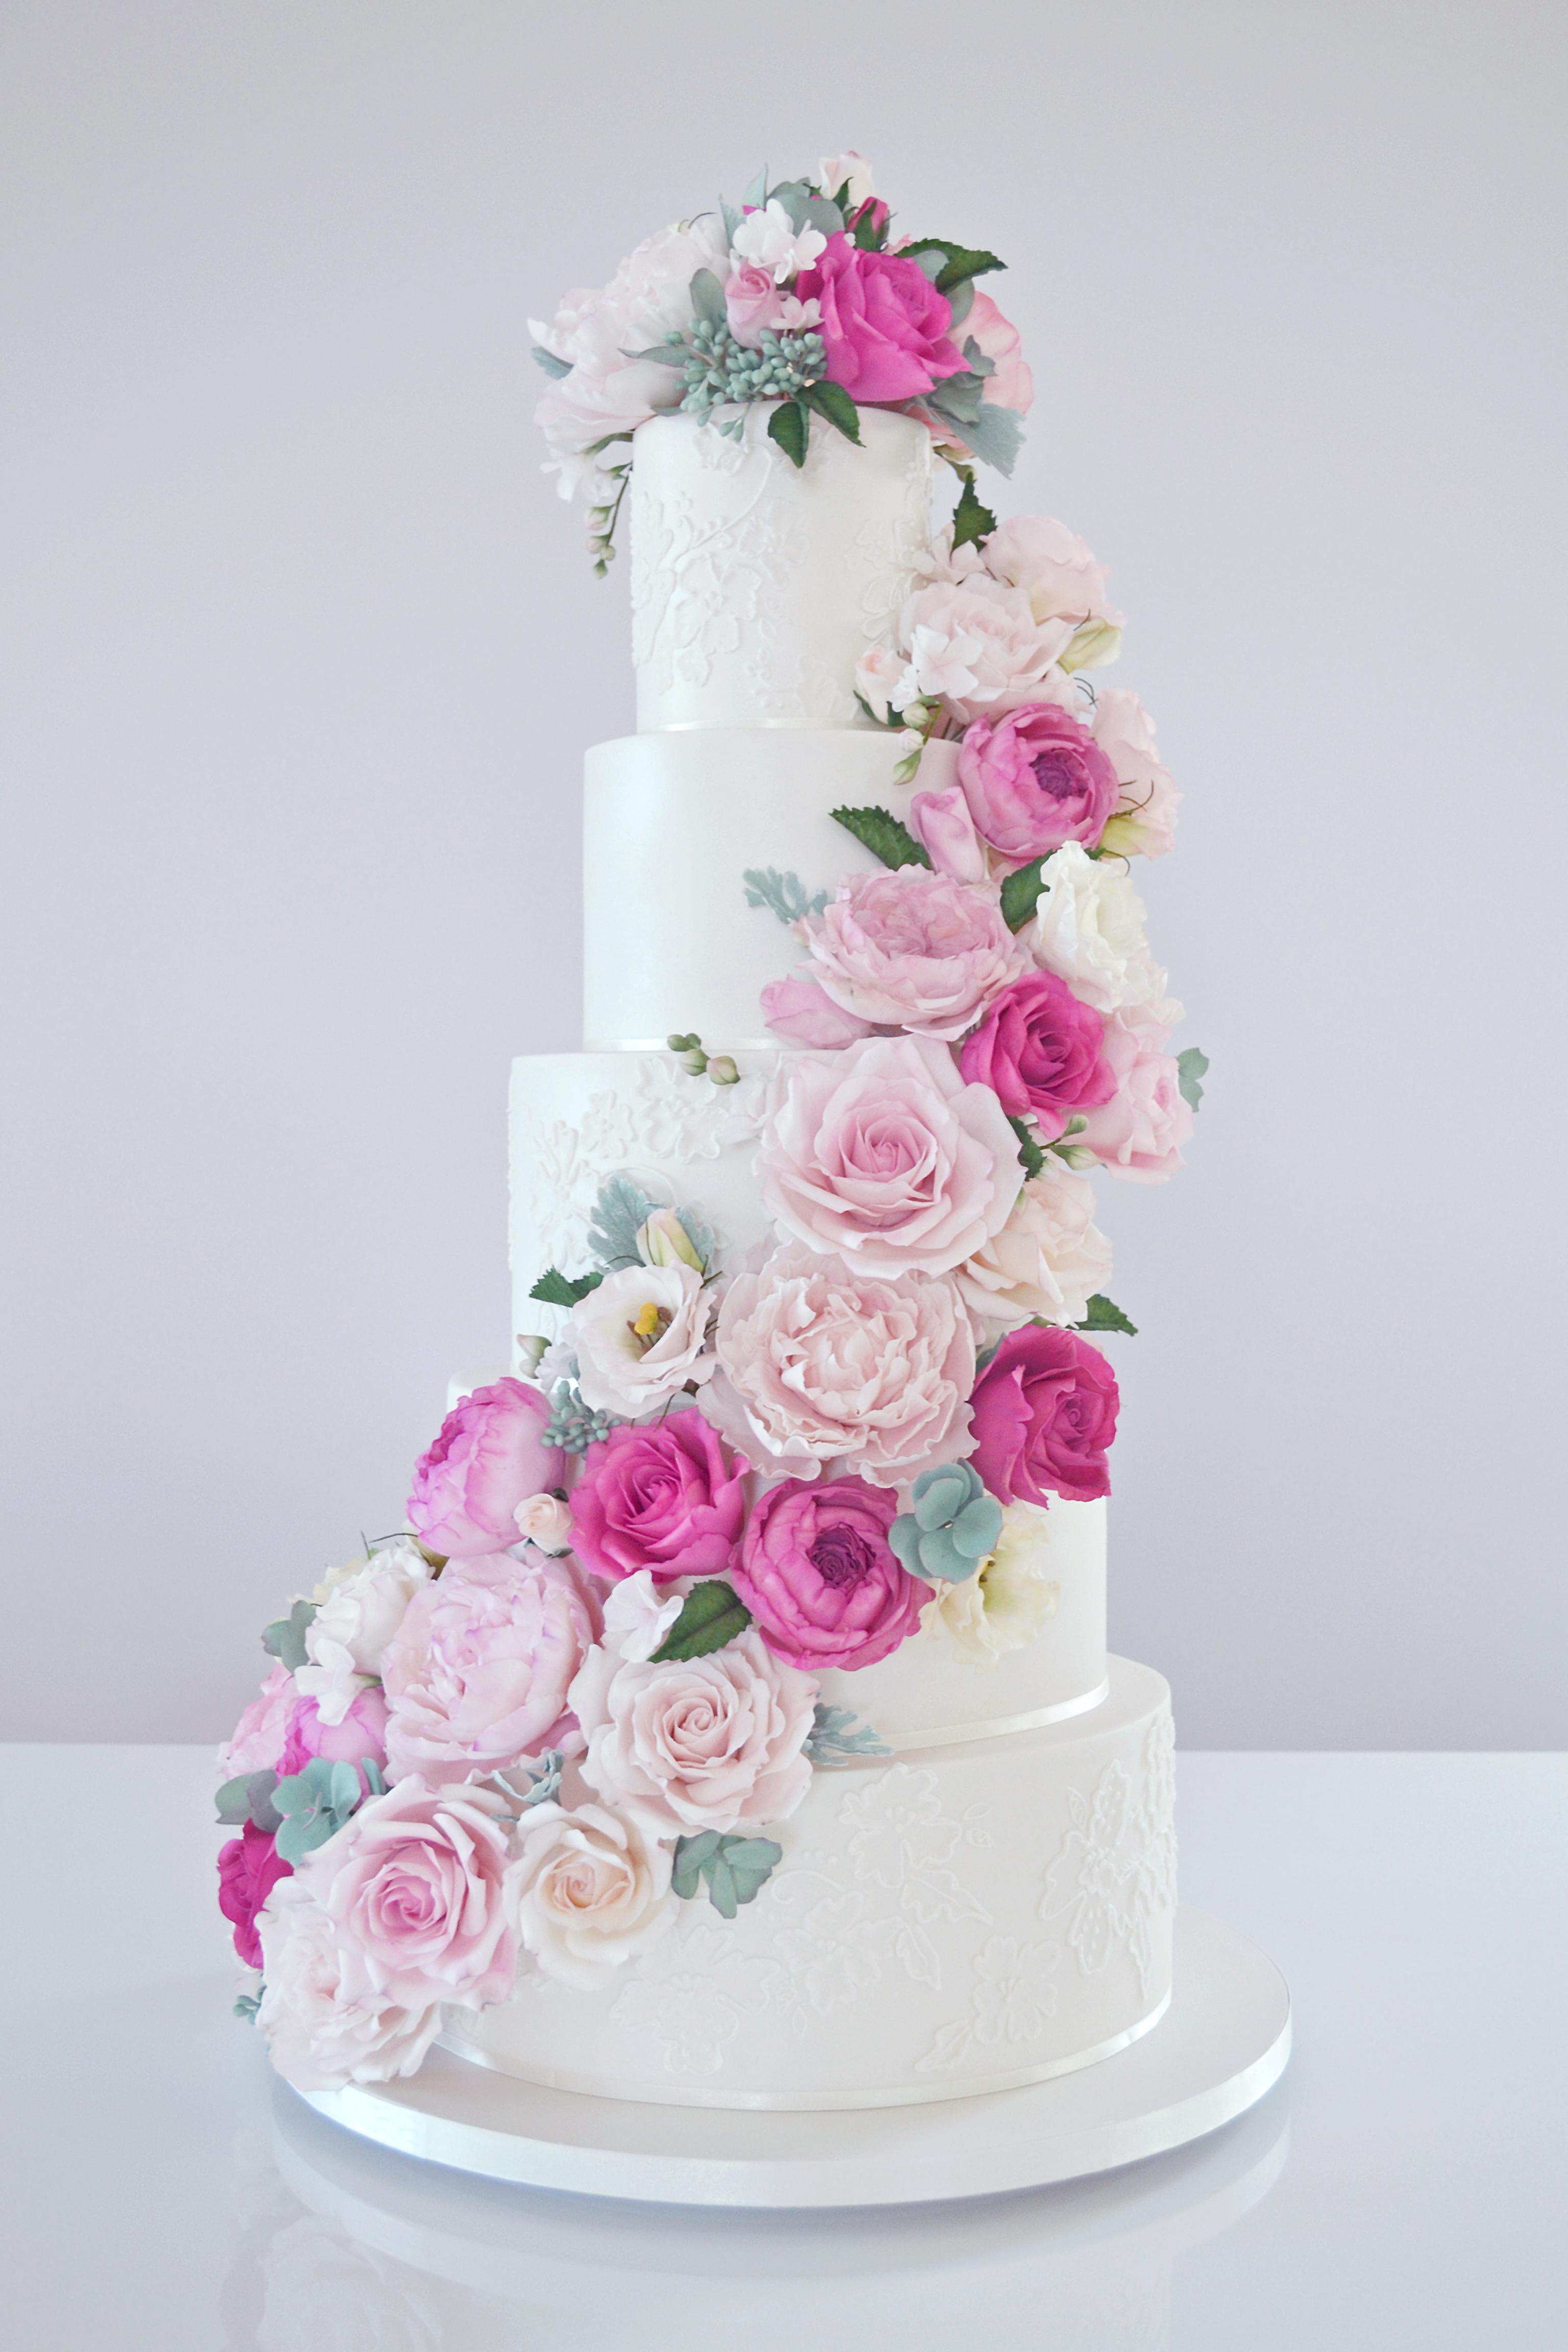 White fondant wedding cake with Cascading gum paste Pink Flowers